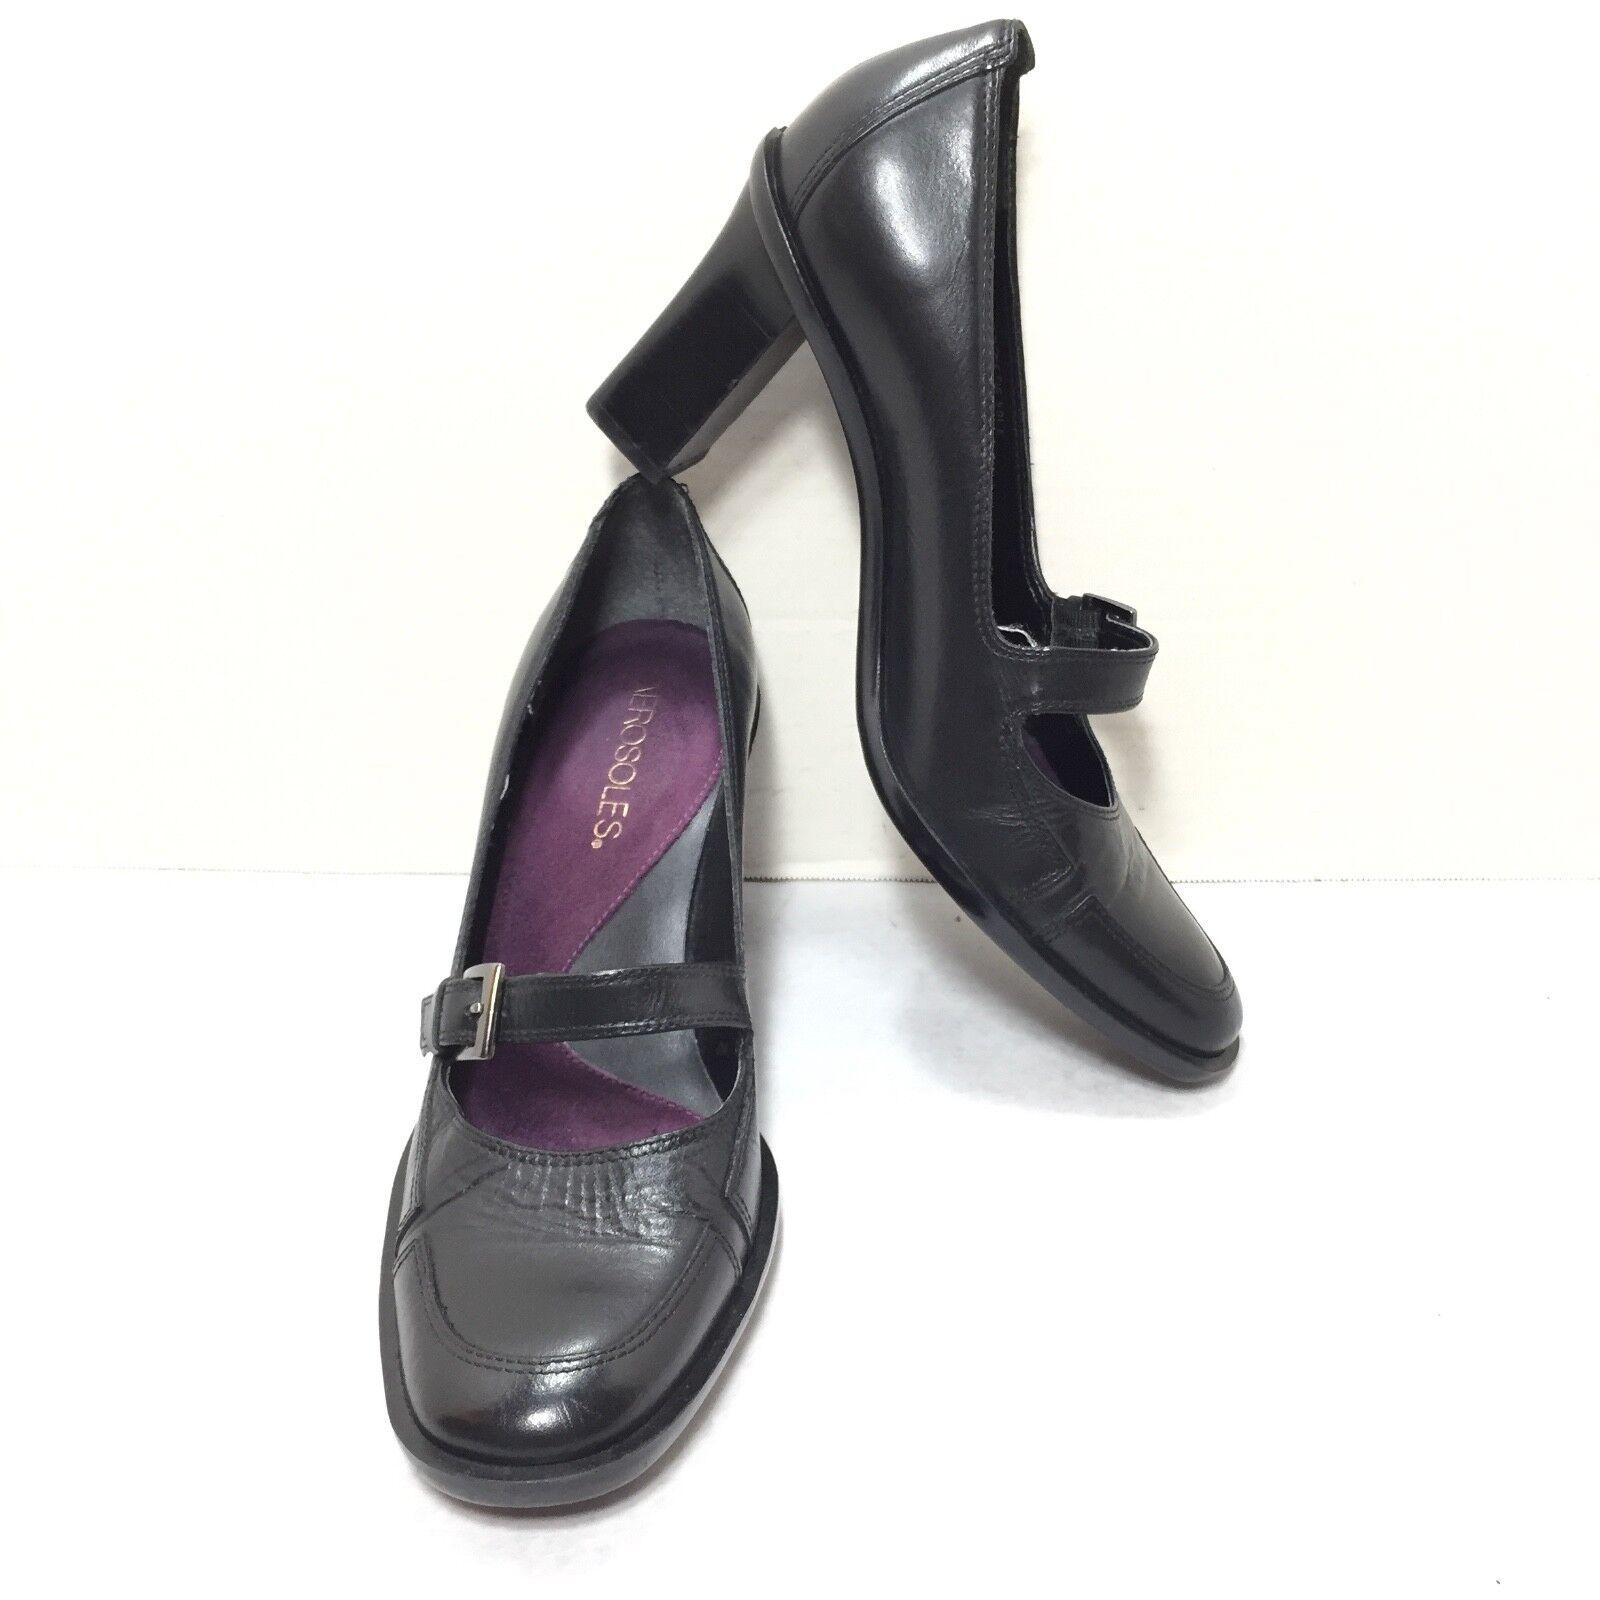 Women's Aerosoles Black Leather Mary Jane High Heel Pumps Size 5.5 B